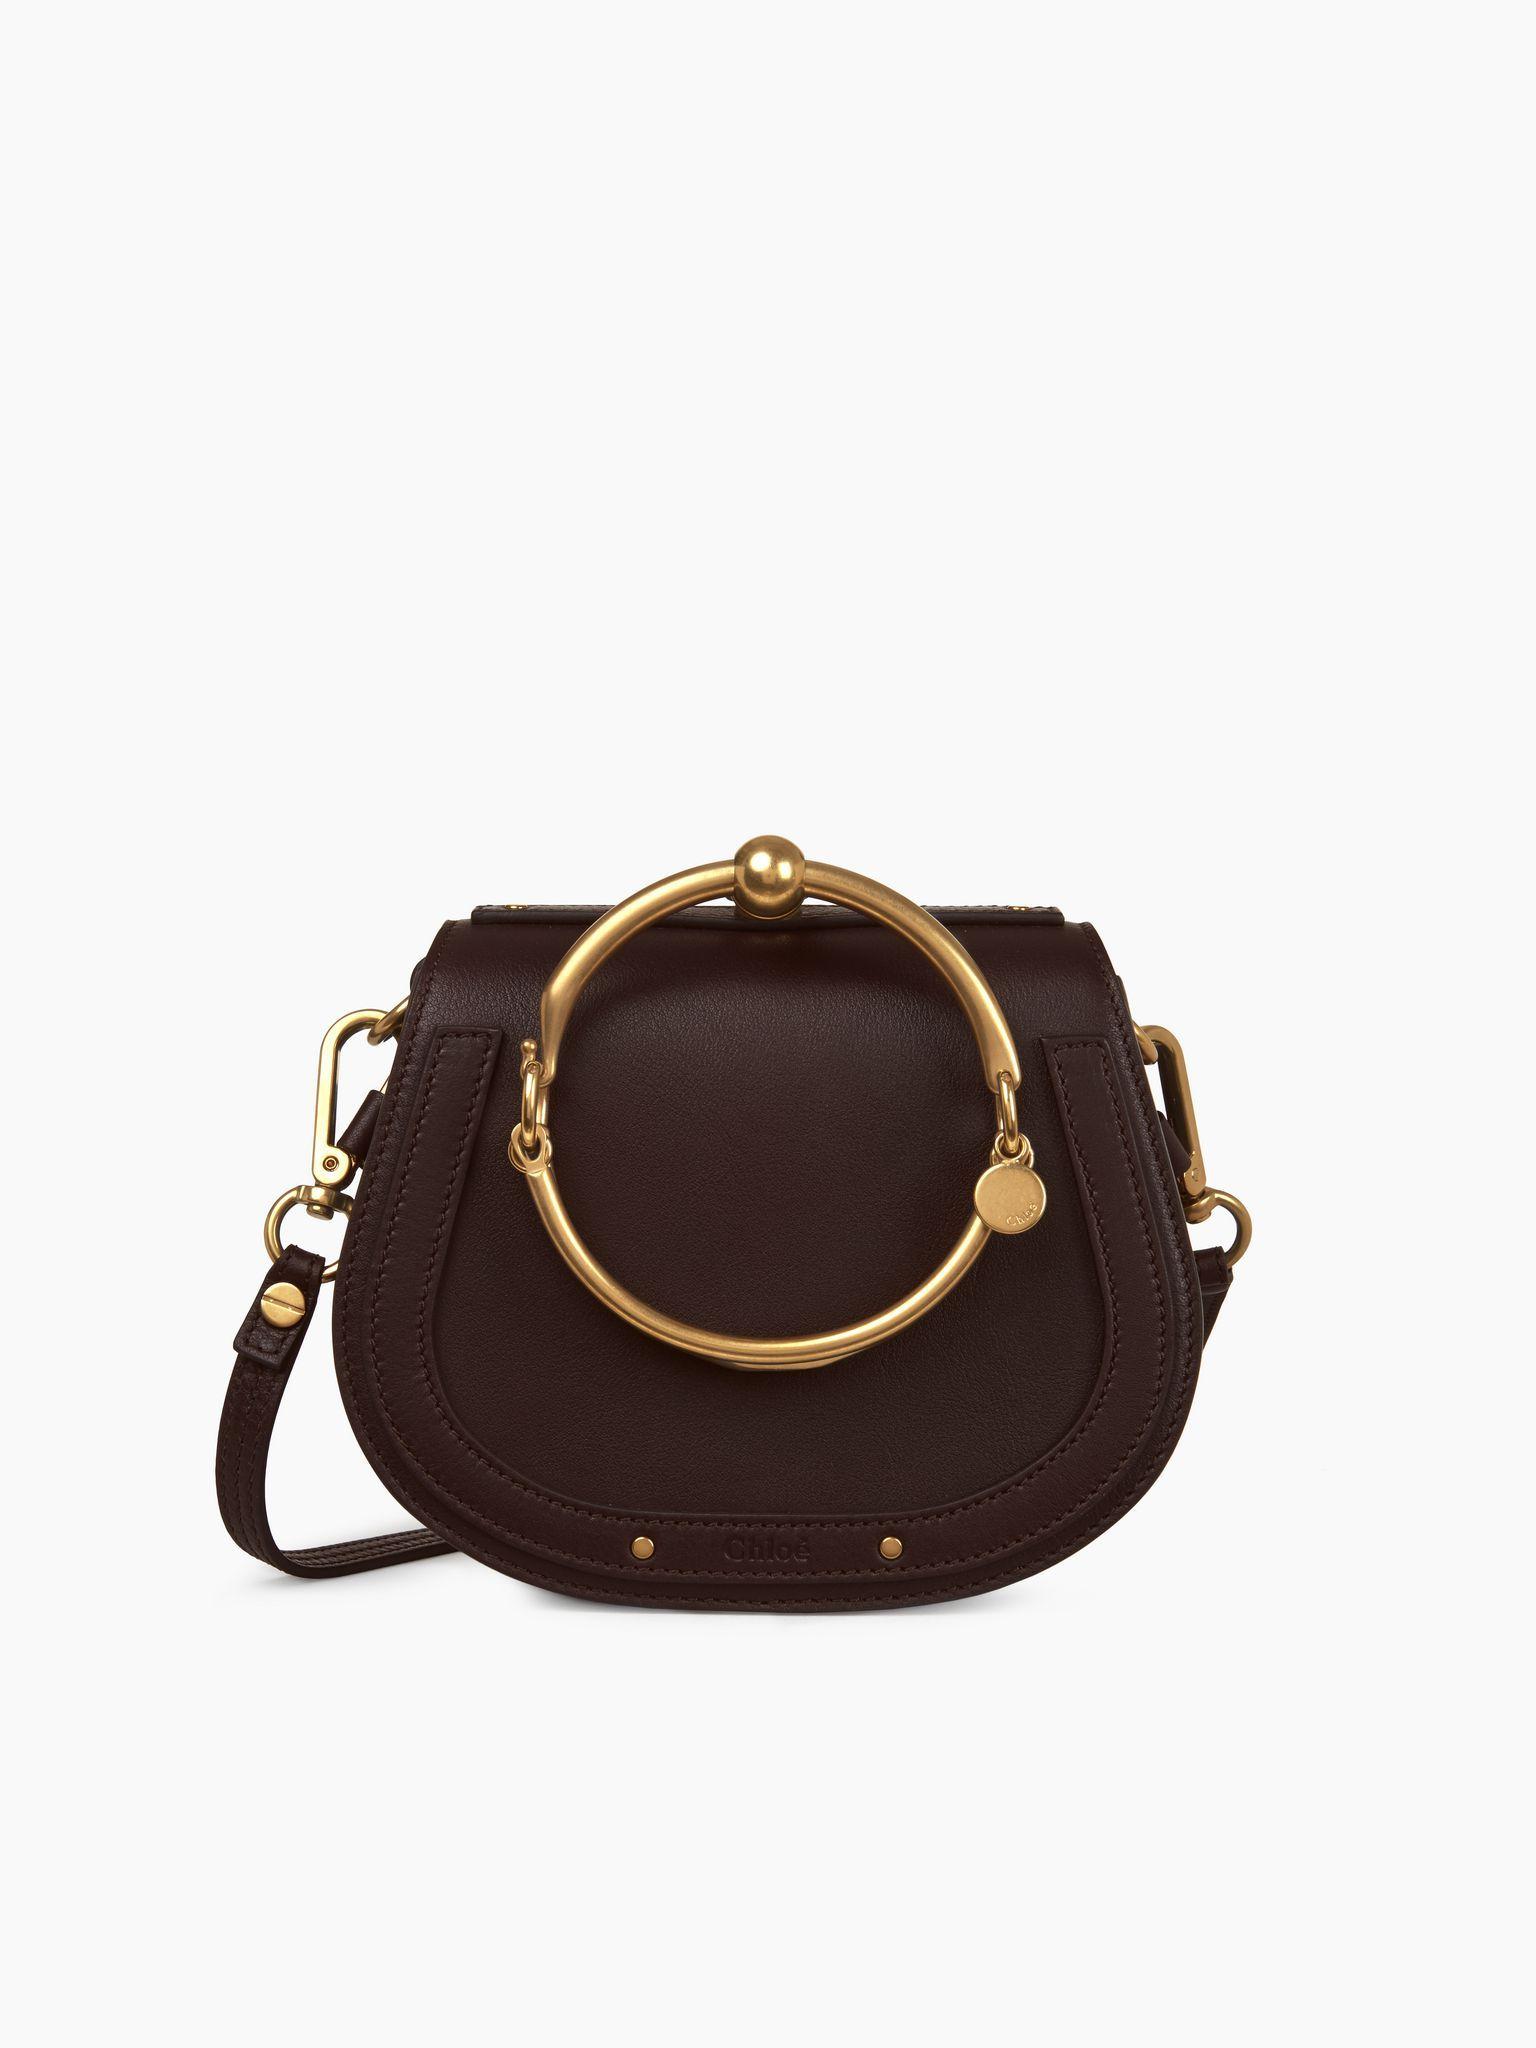 0a703f8bf1 Chloe Small Nile Bracelet Bag, Women's Bags | Chloé Official Website ...